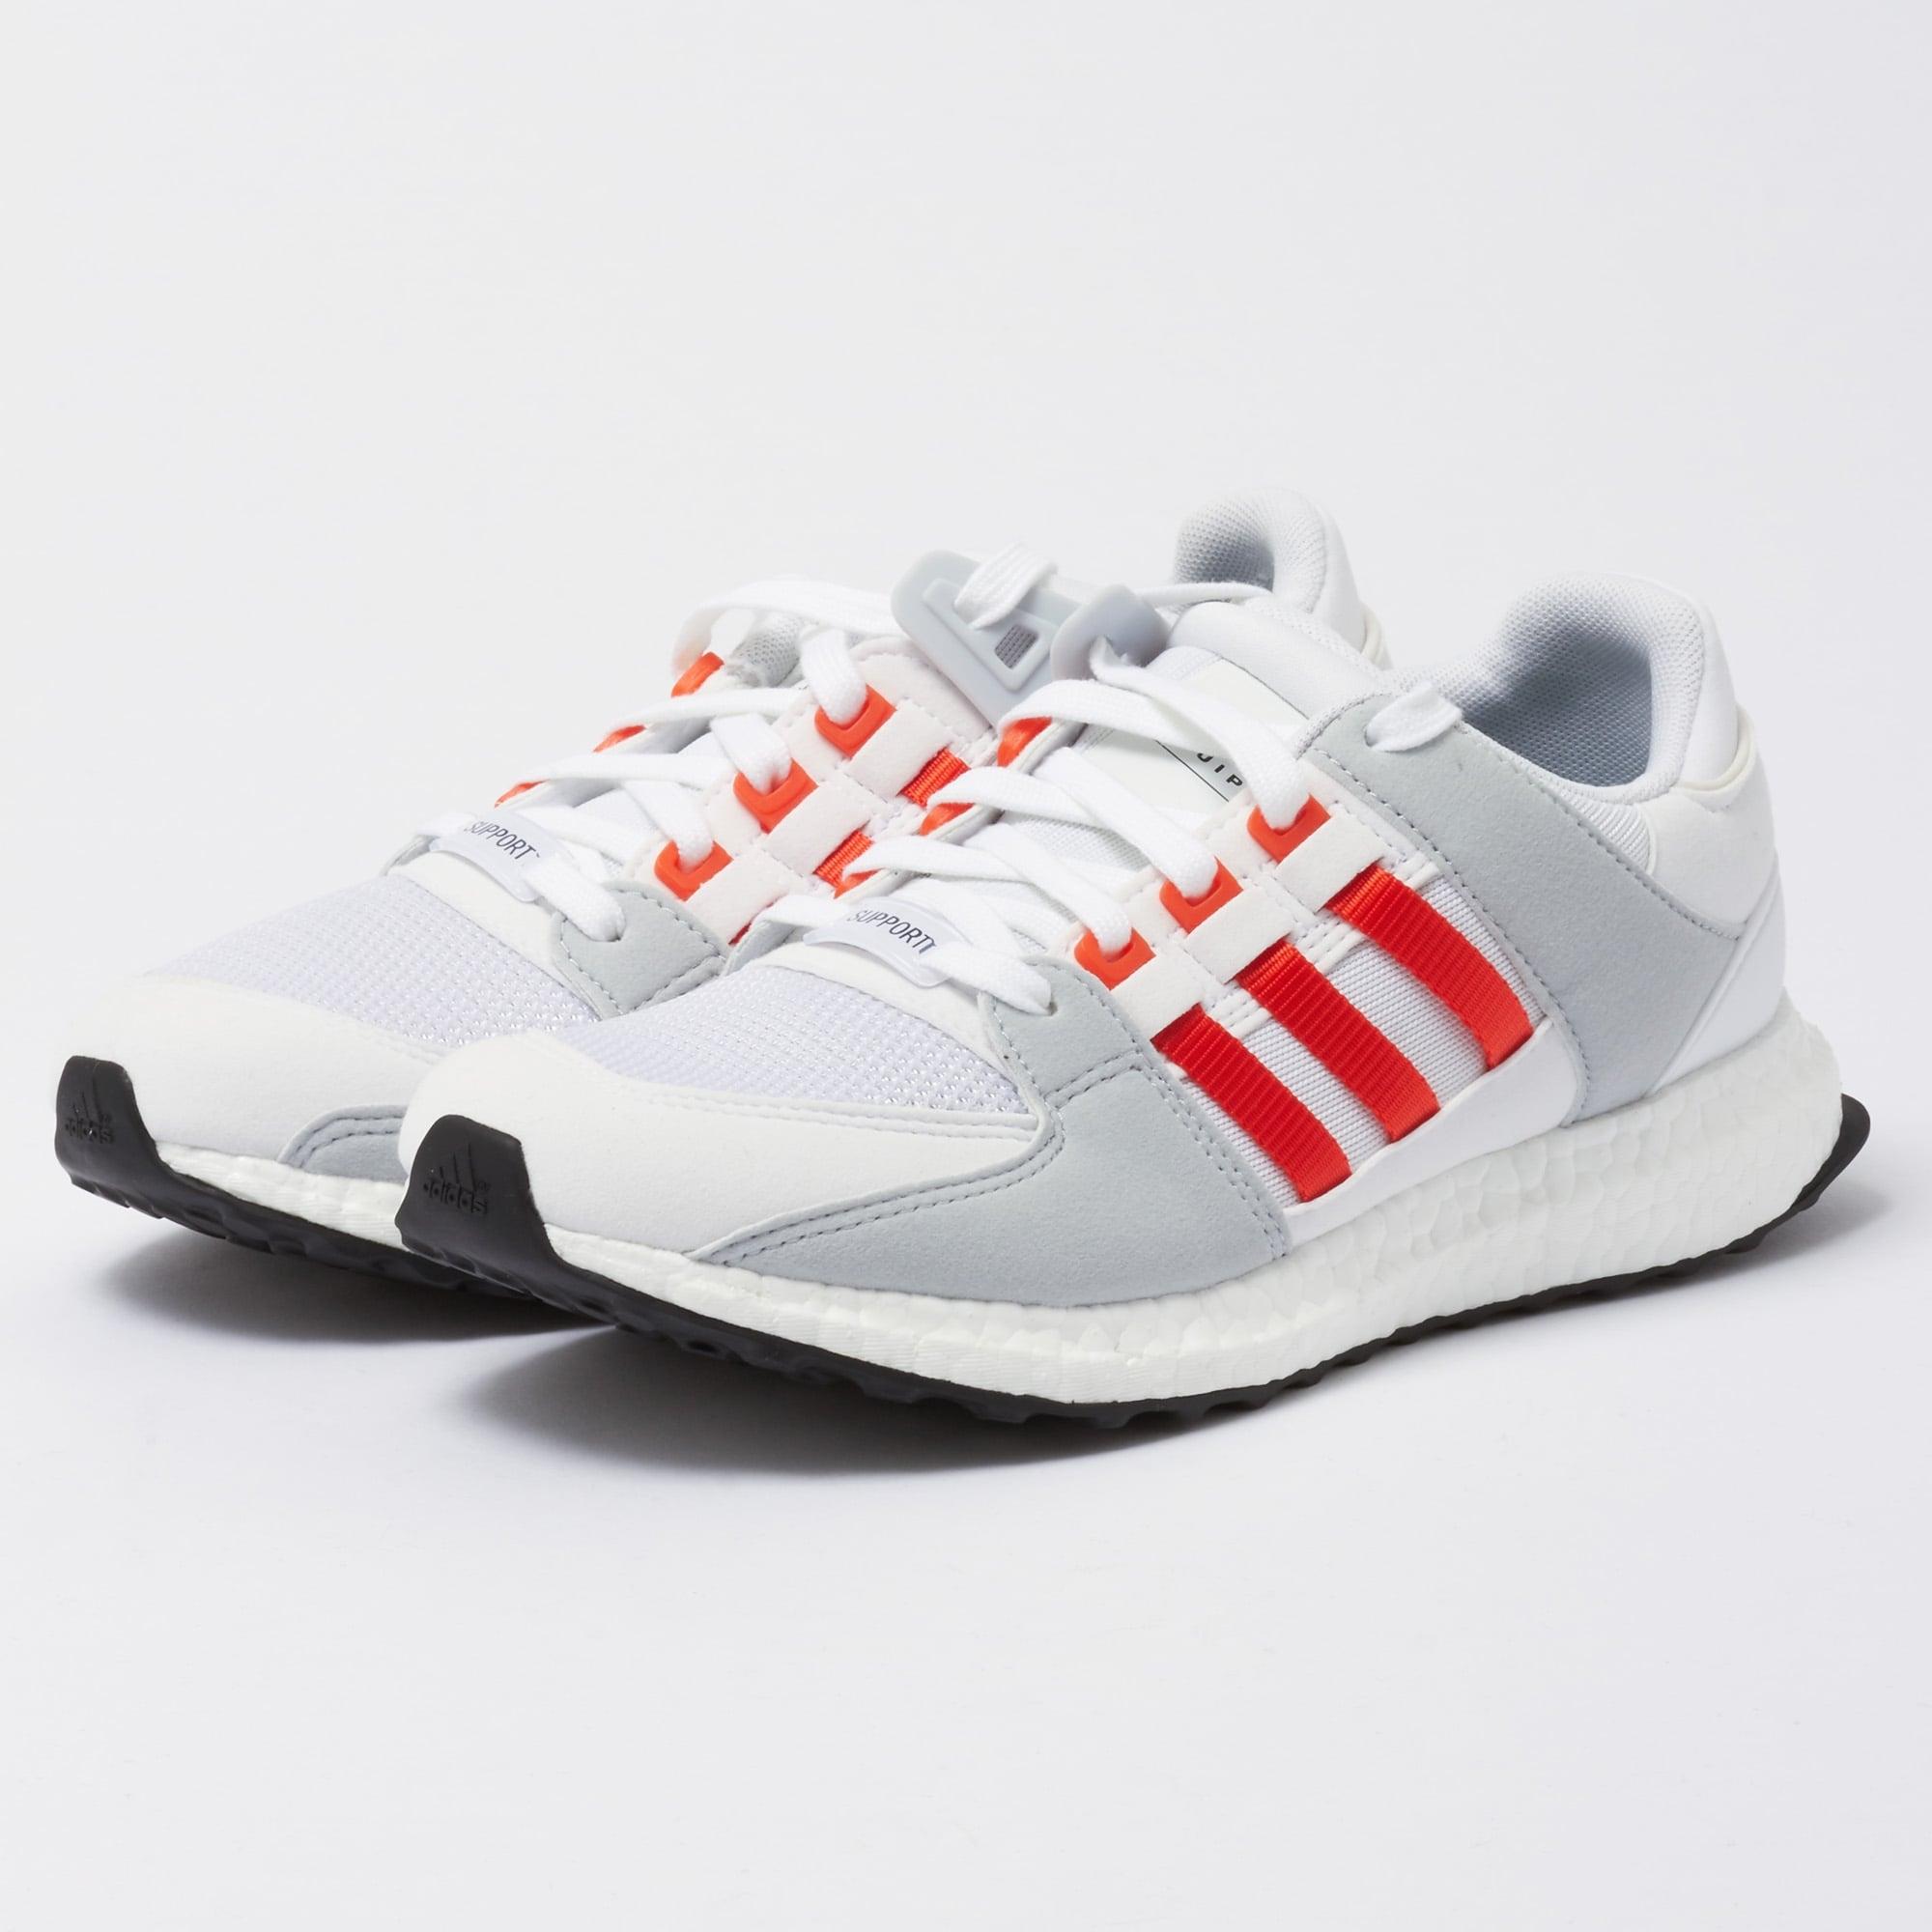 adidas eqt support ultra